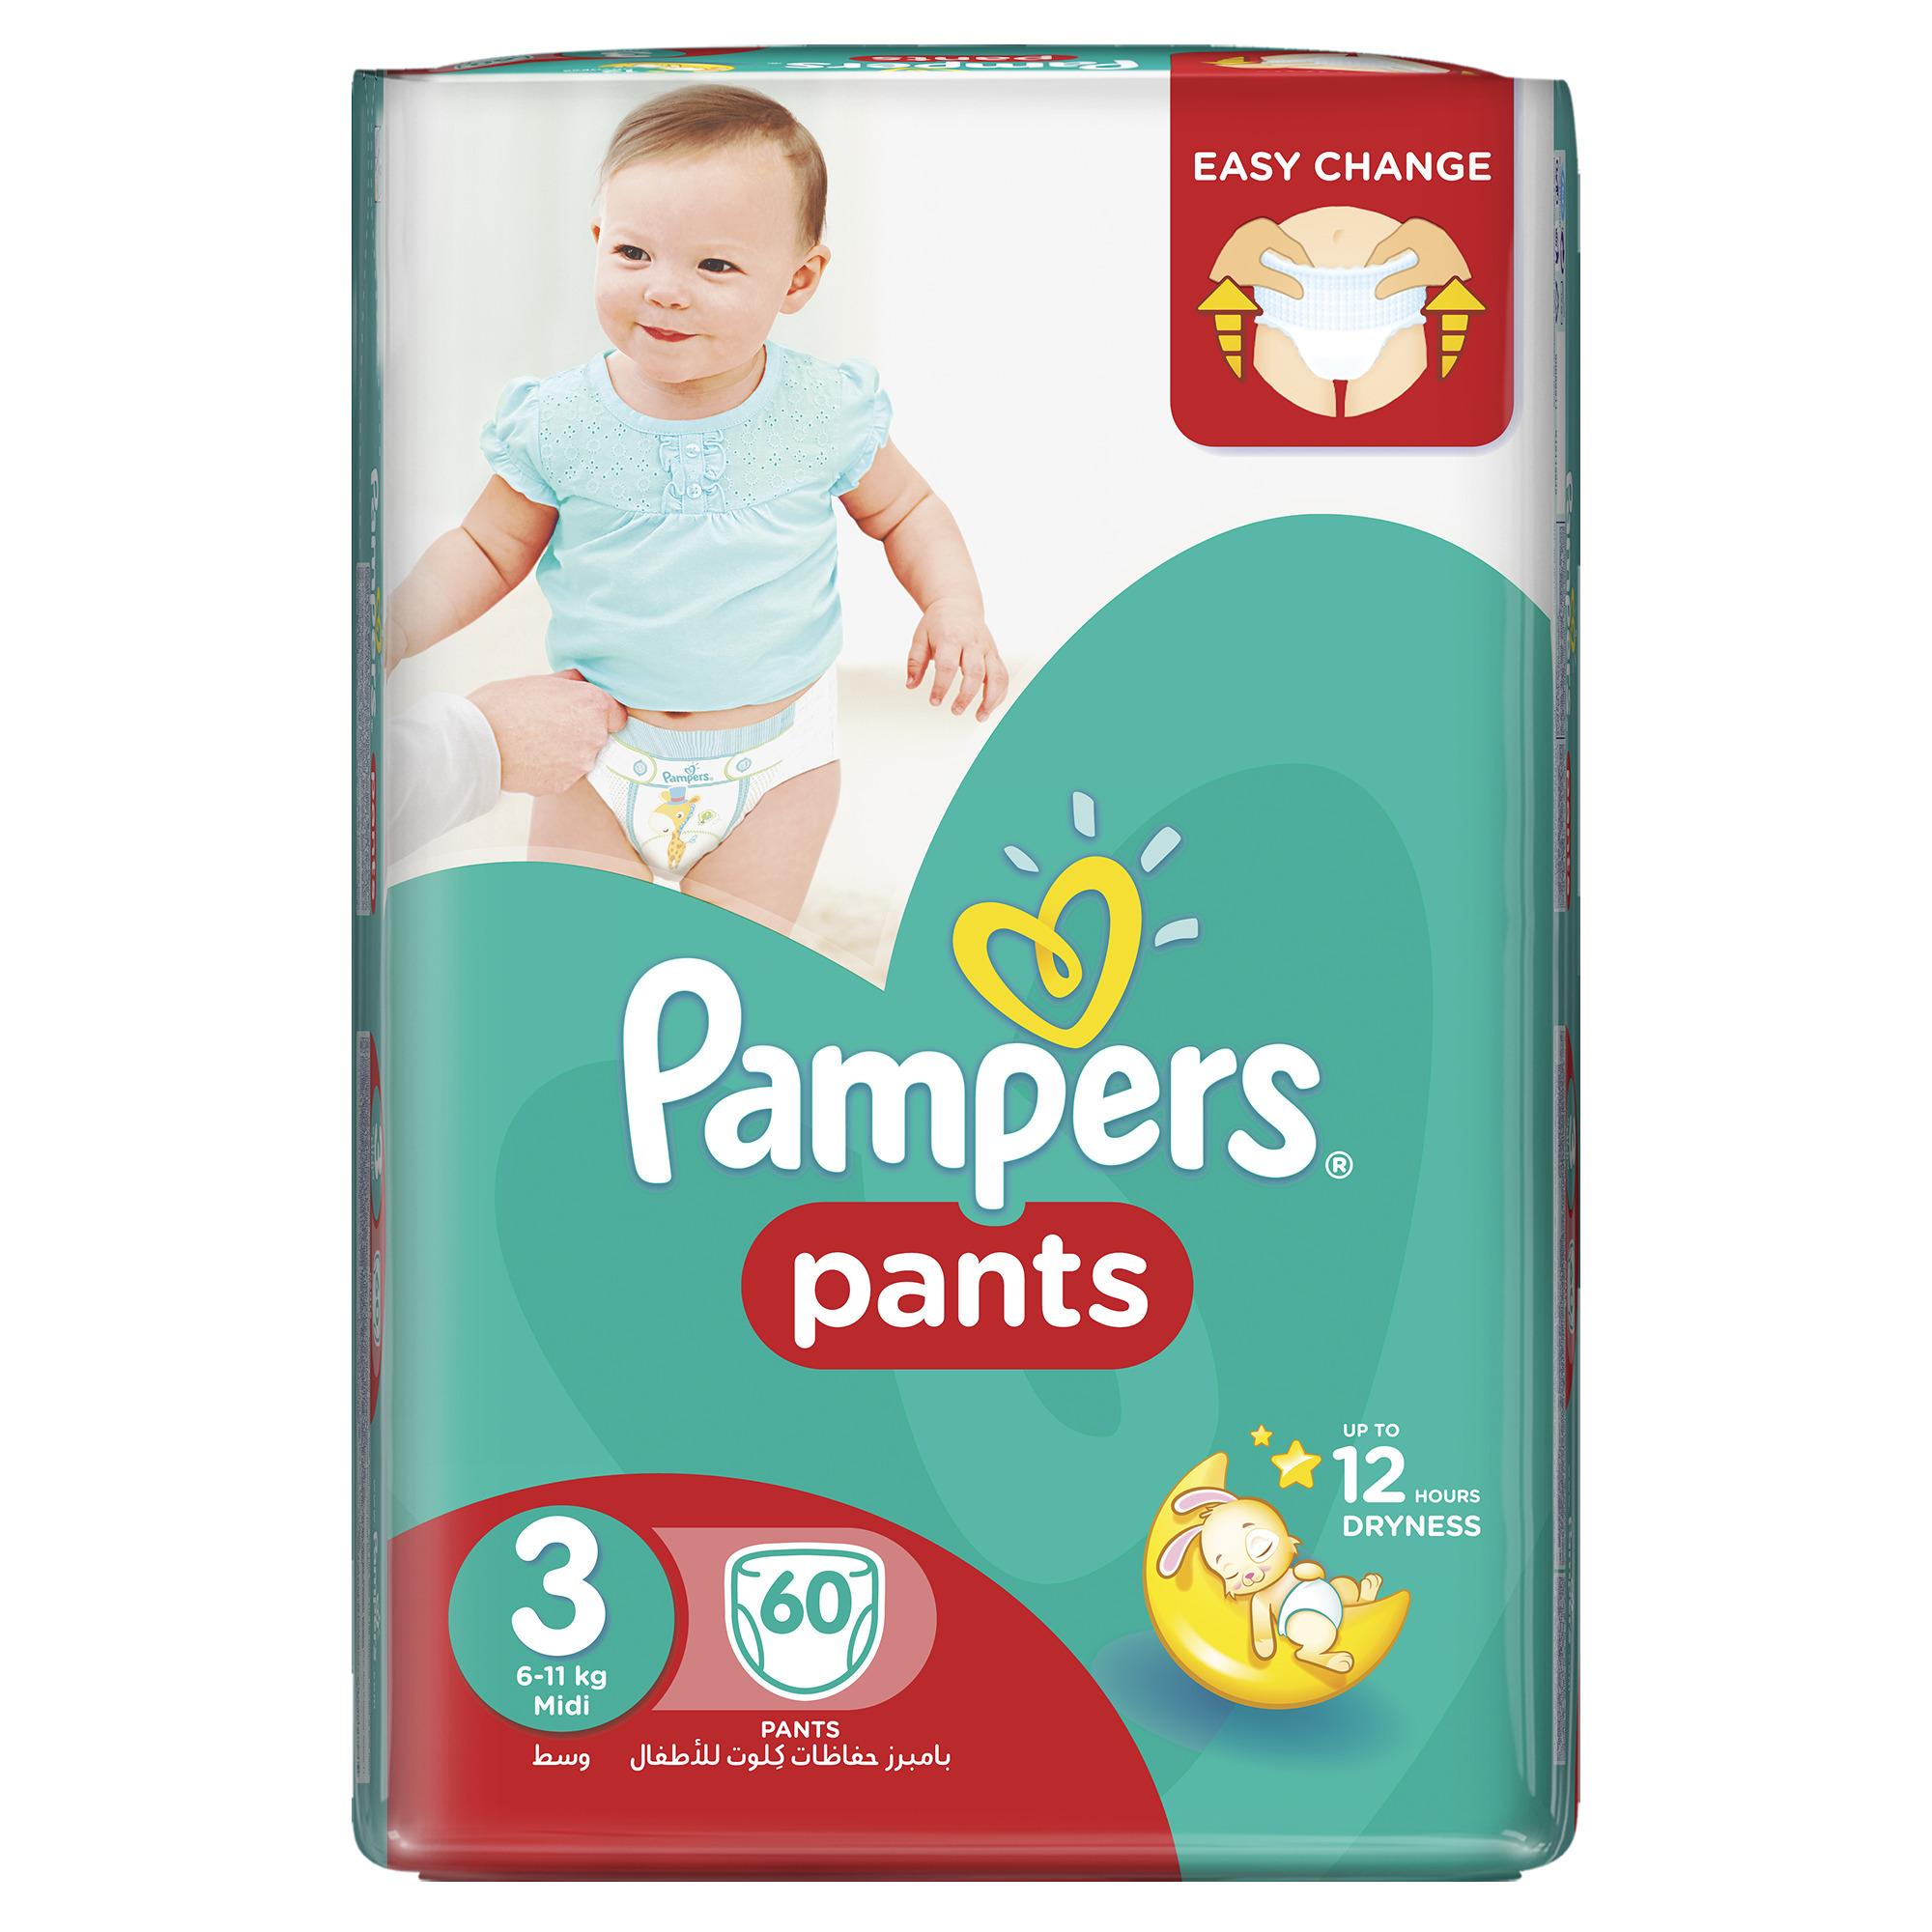 Sauskelnės PAMPERS Pants, JP, 3 dydis 4 - 9 kg, 60 vnt